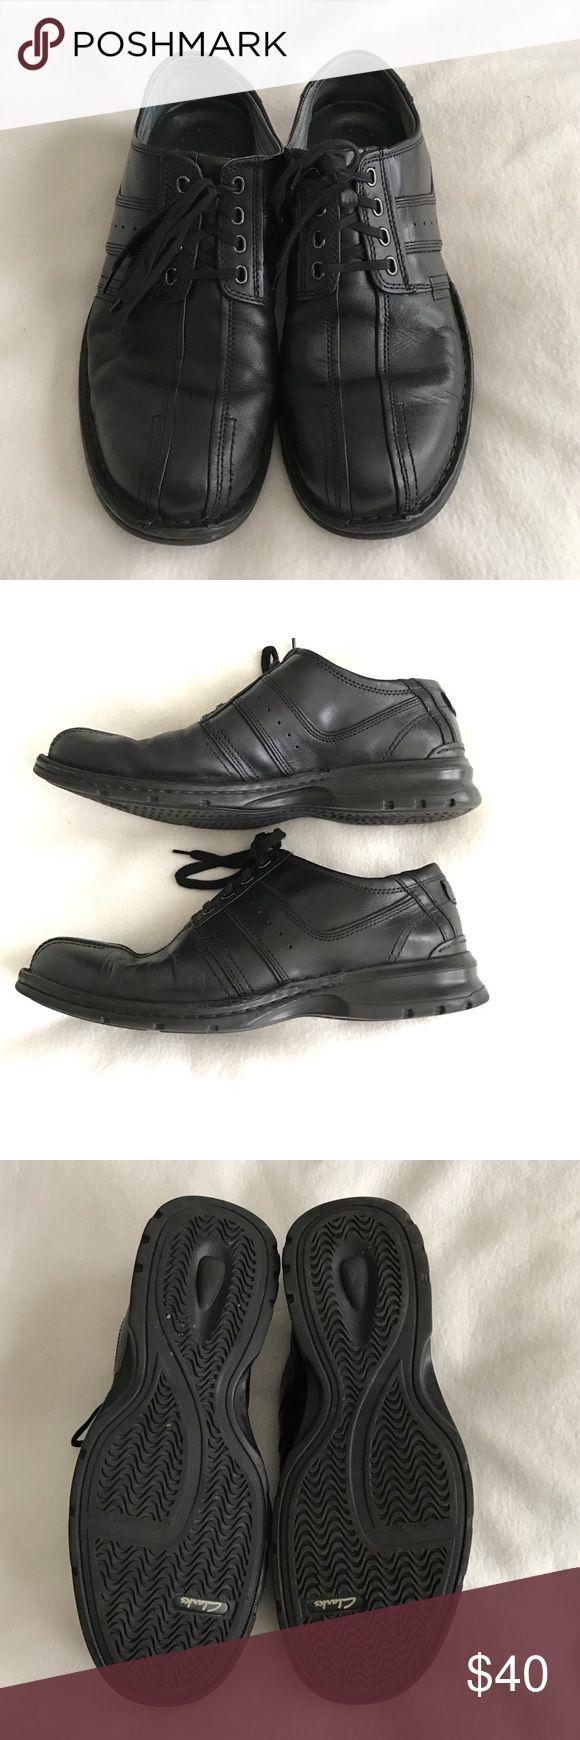 Men's Clarks black leather lace up shoes size 10.5 Men's Clarks black leather lace up shoes size 10.5. Gently used. Clarks Shoes Oxfords & Derbys